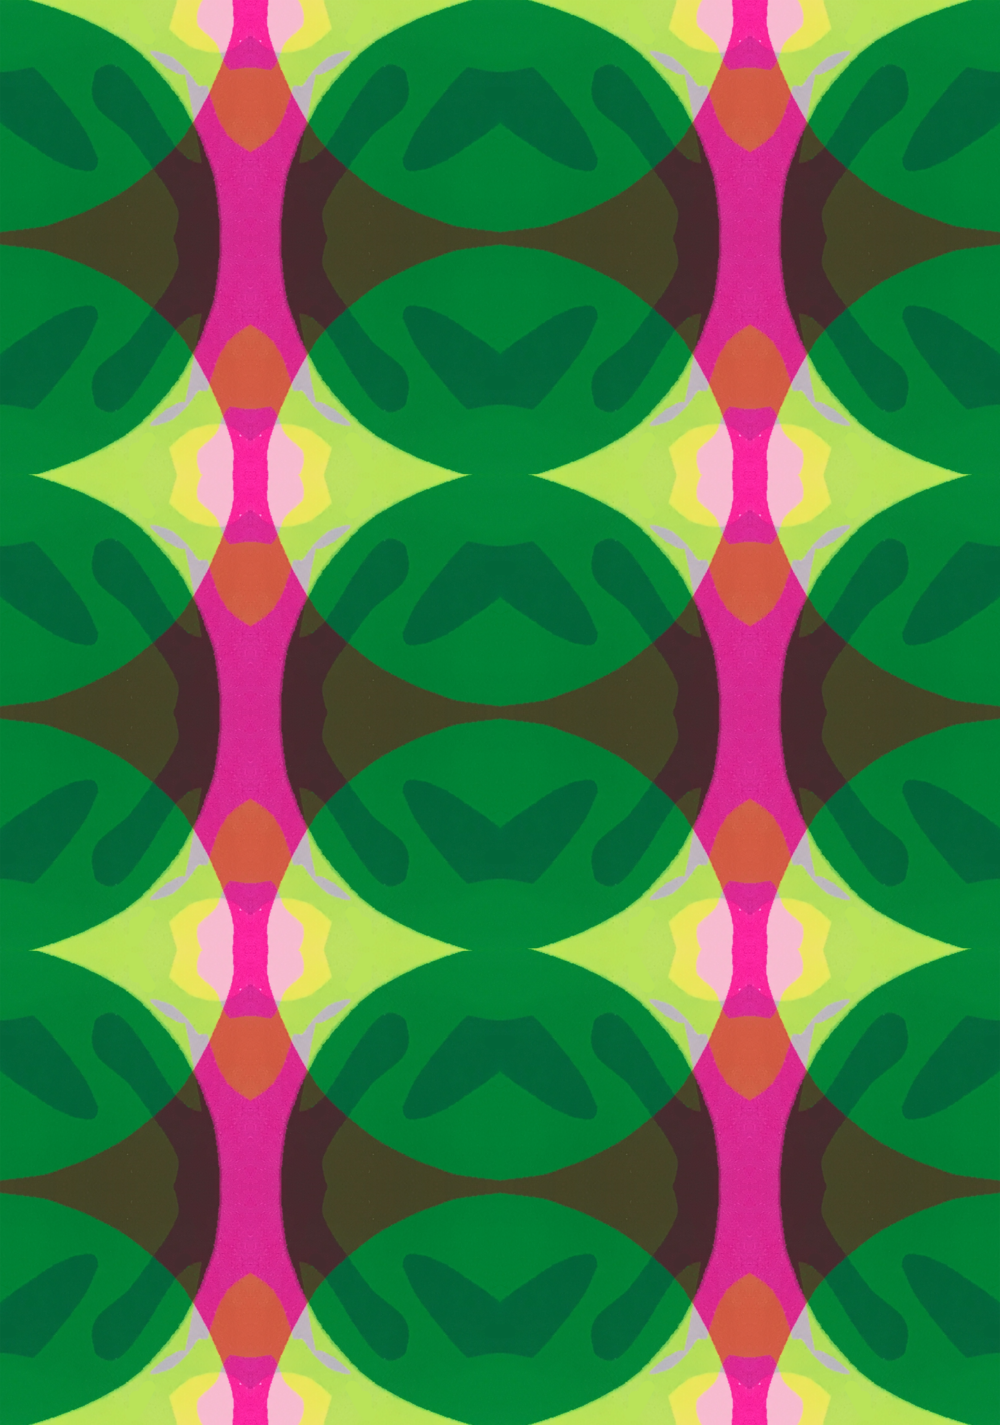 Amazon Circles pattern.png